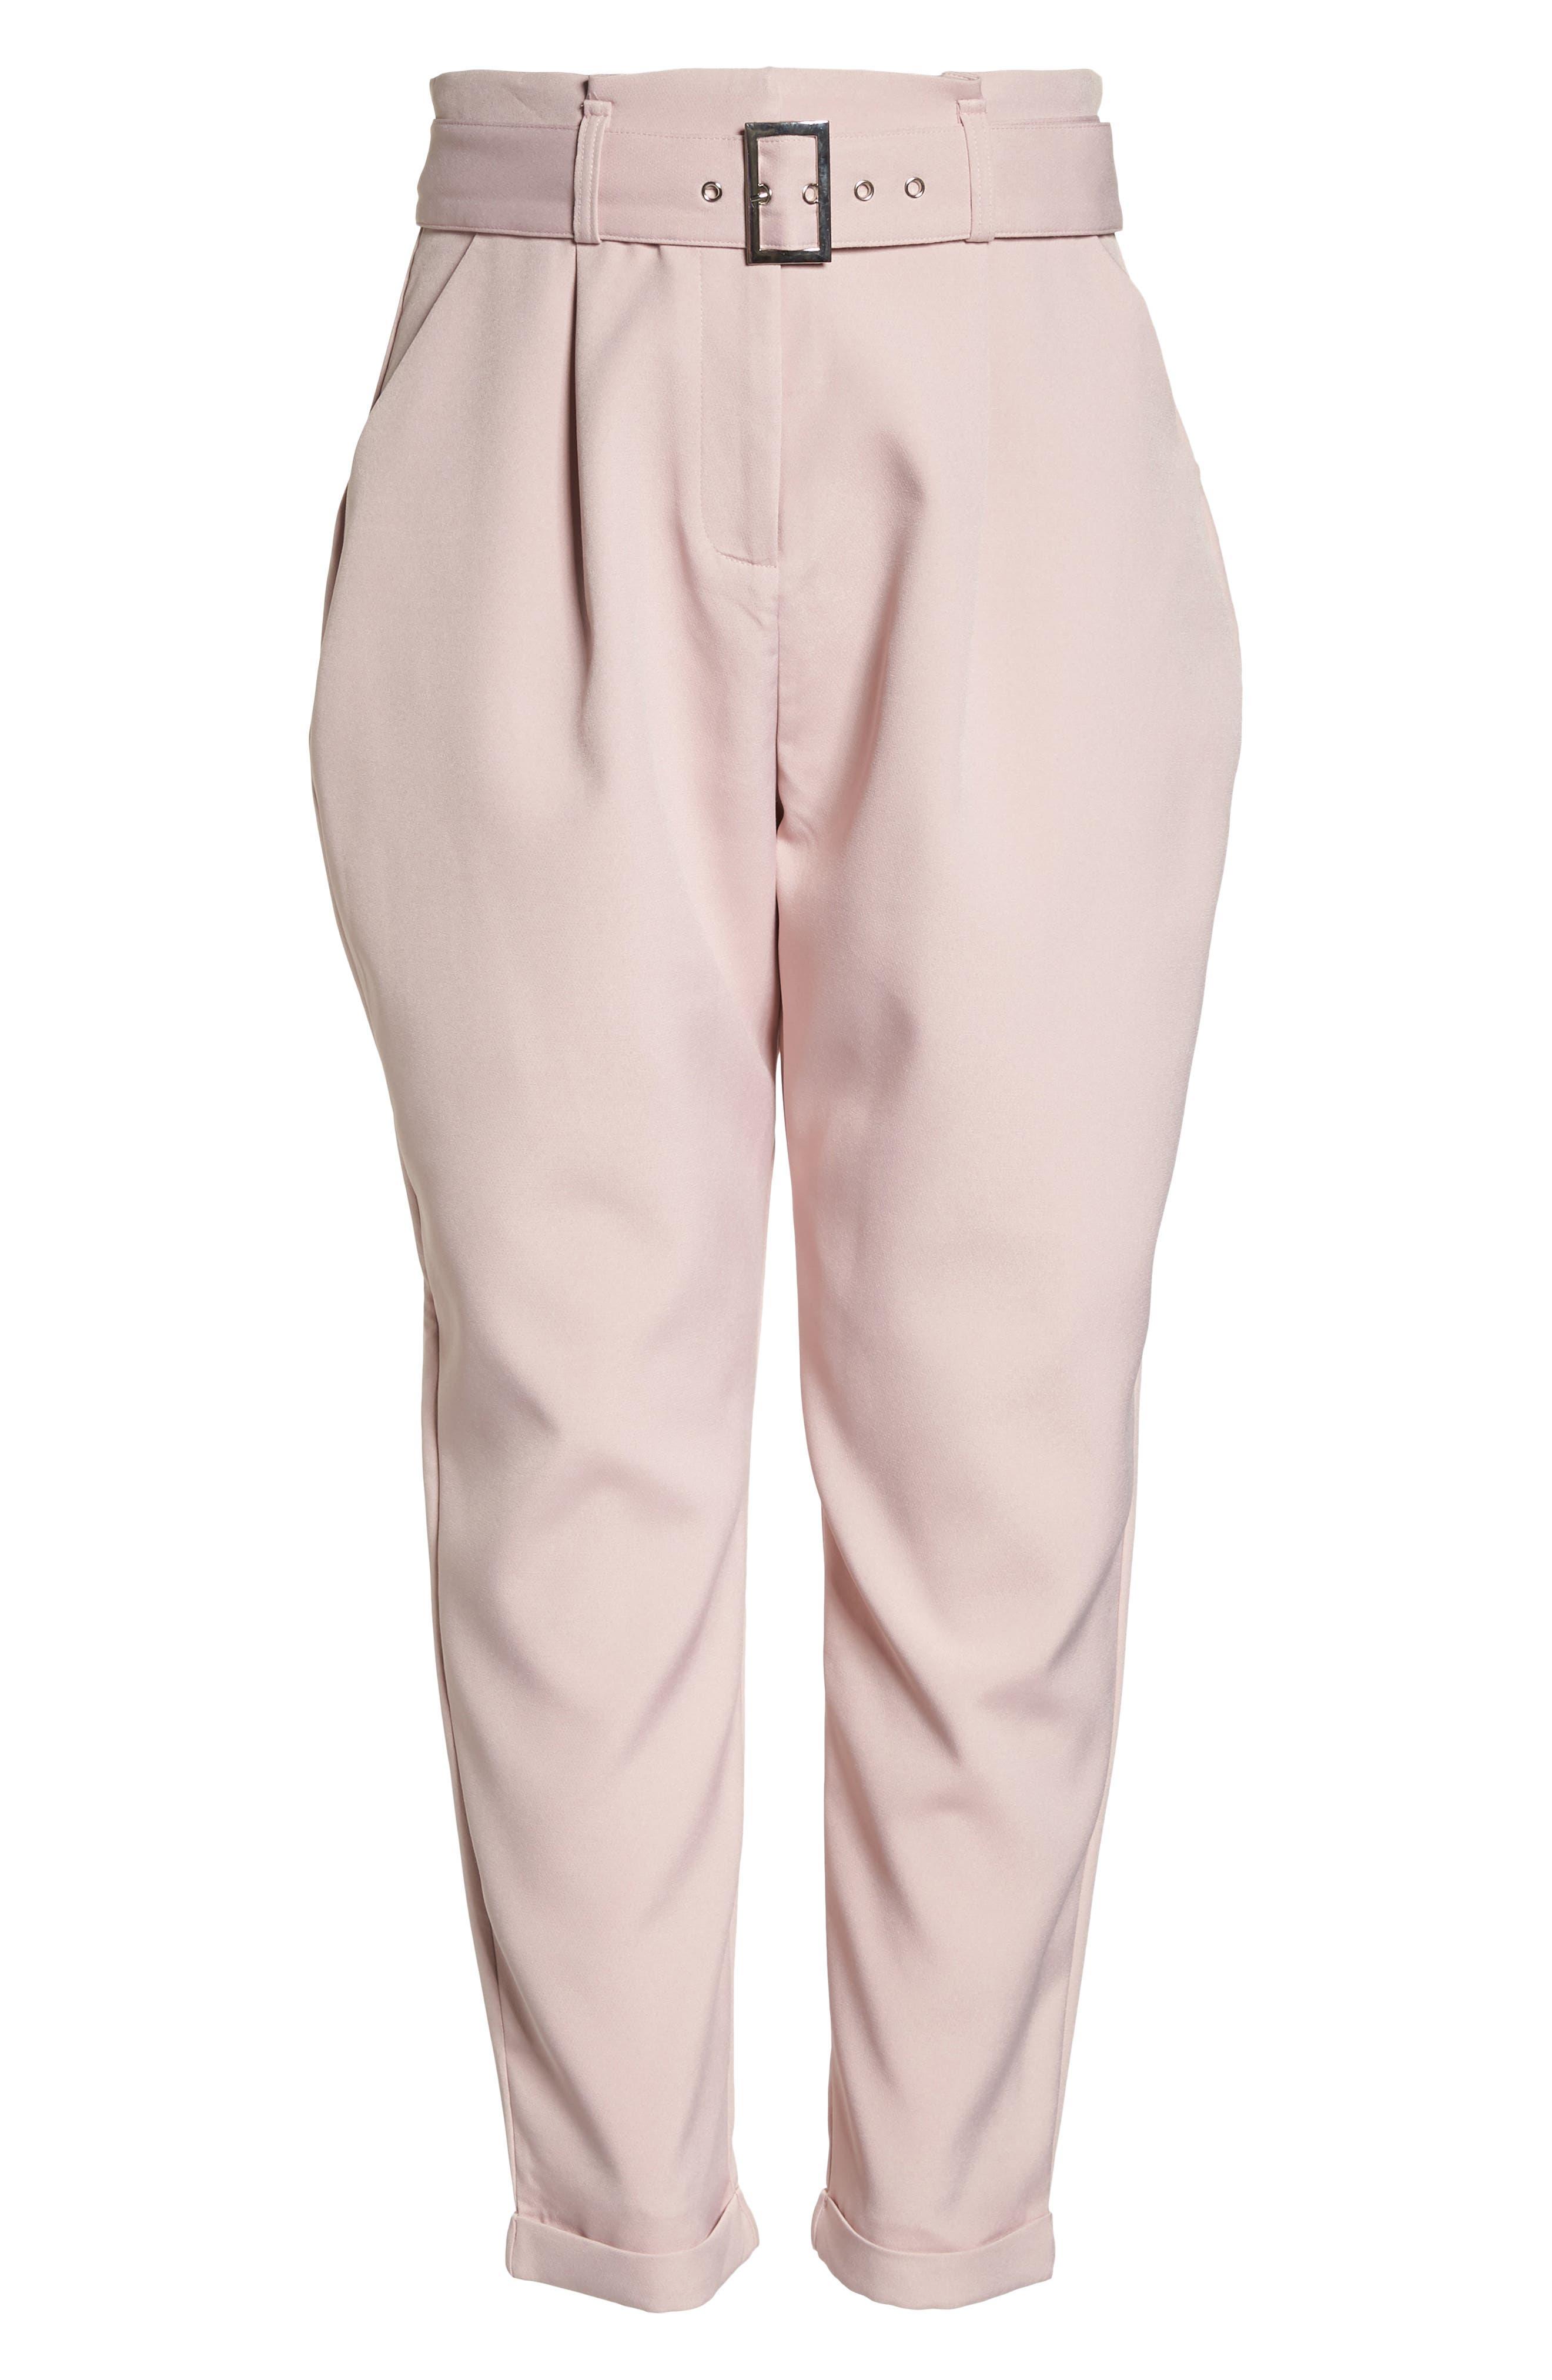 Belted Peg Trousers,                             Alternate thumbnail 7, color,                             Blush